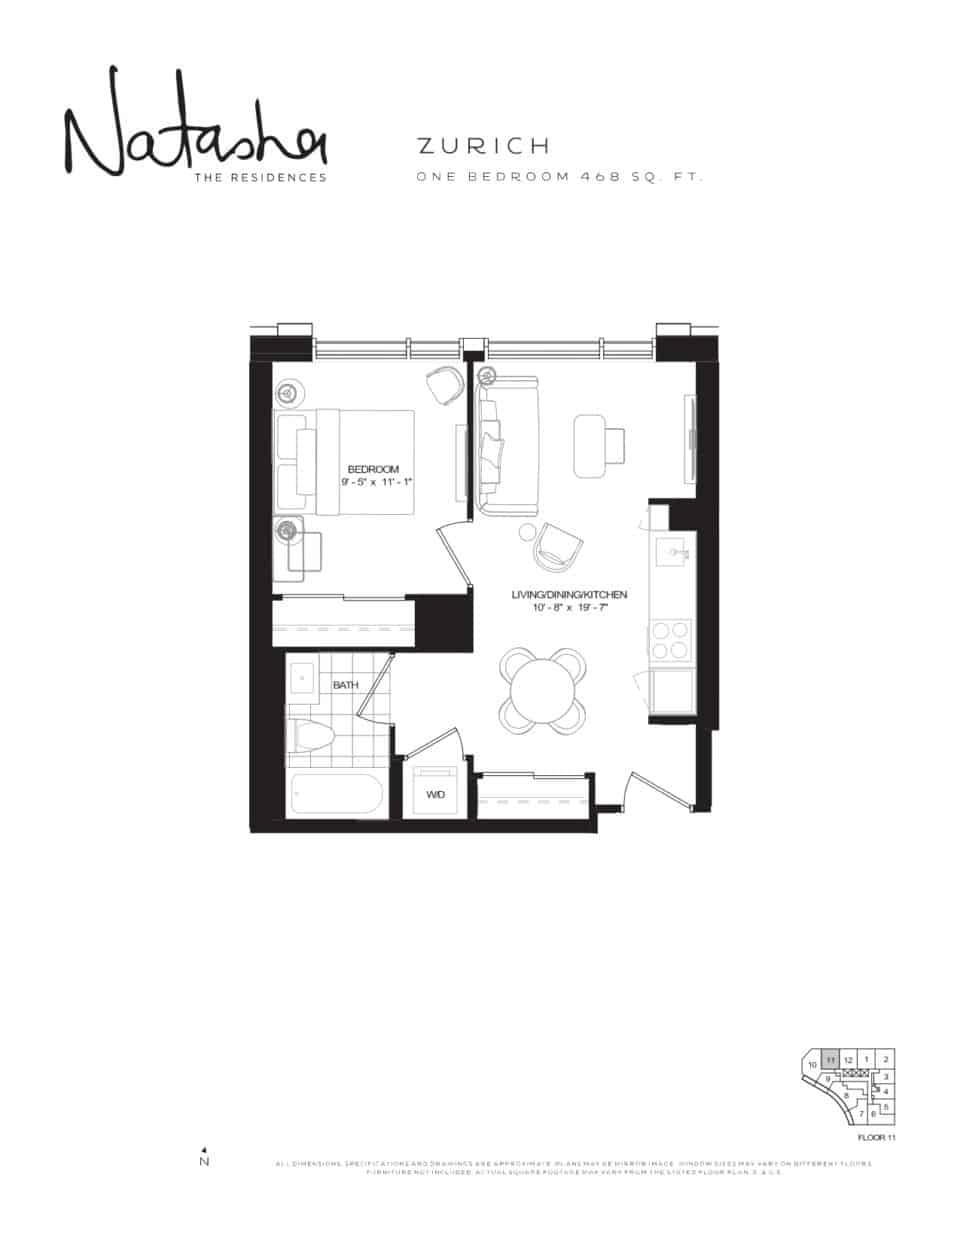 2021 09 02 11 03 35 natashatheresidences lanterradevelopments floorplans zurich